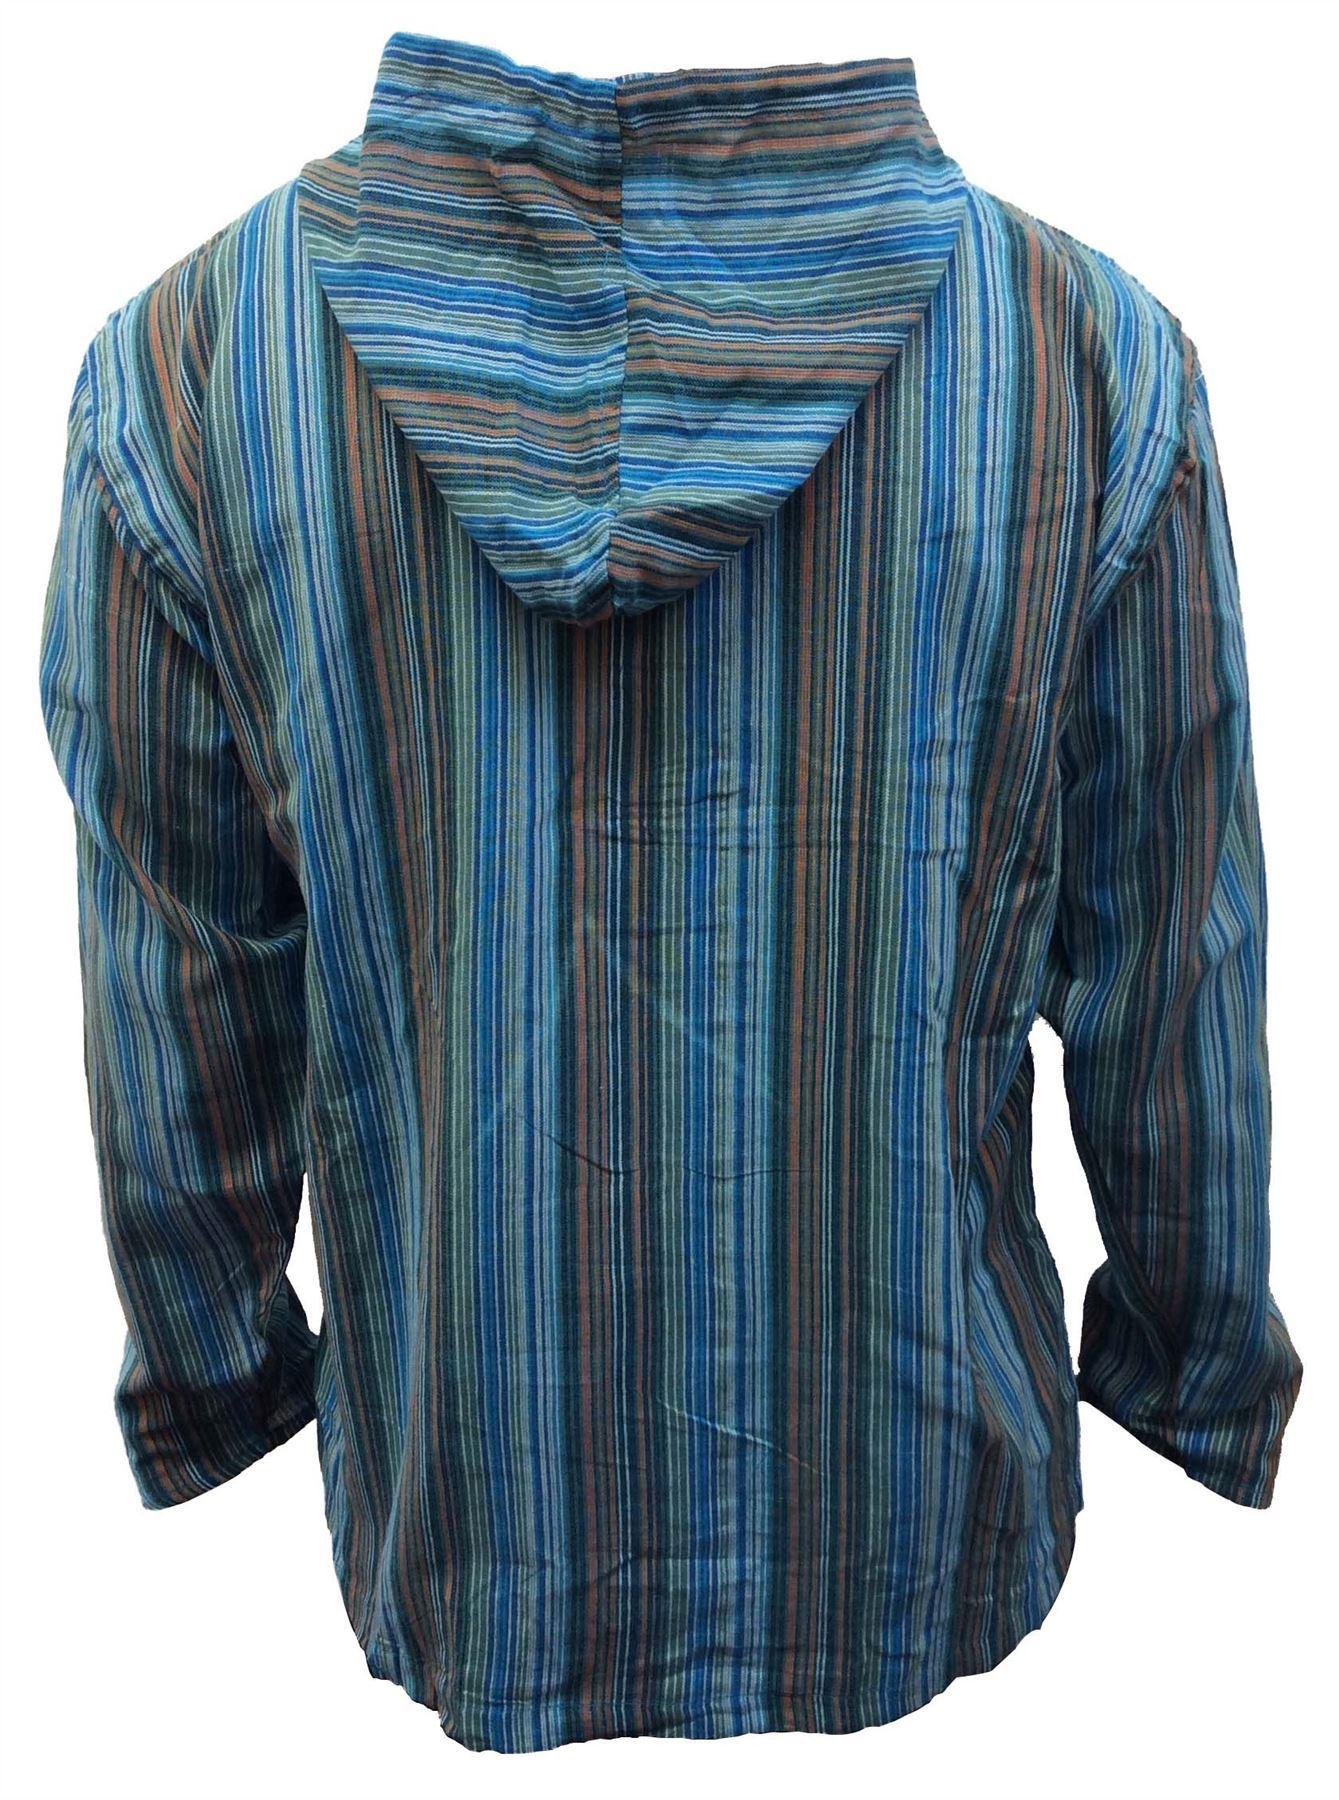 Men-039-s-Cotton-Grandad-Shirt-Full-Sleeved-Hippie-Top-Festival-Stripe-Hippy-Hoodie thumbnail 28